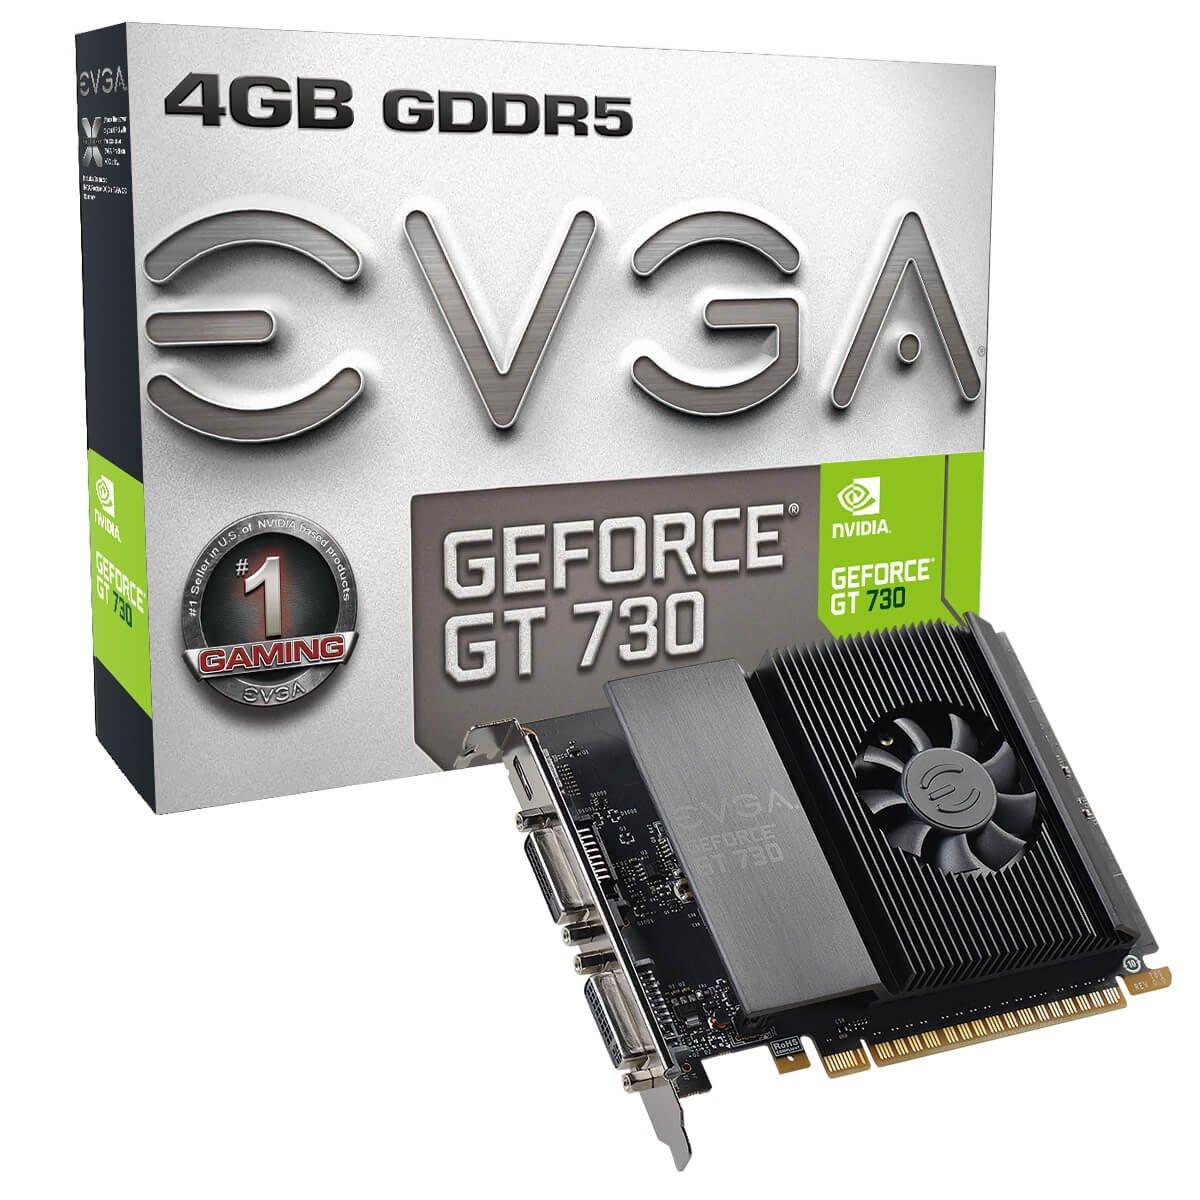 EVGA GeForce GT 730 4GB GDDR5 Single Slot Graphics Card 04G-P3-3739-KR by EVGA